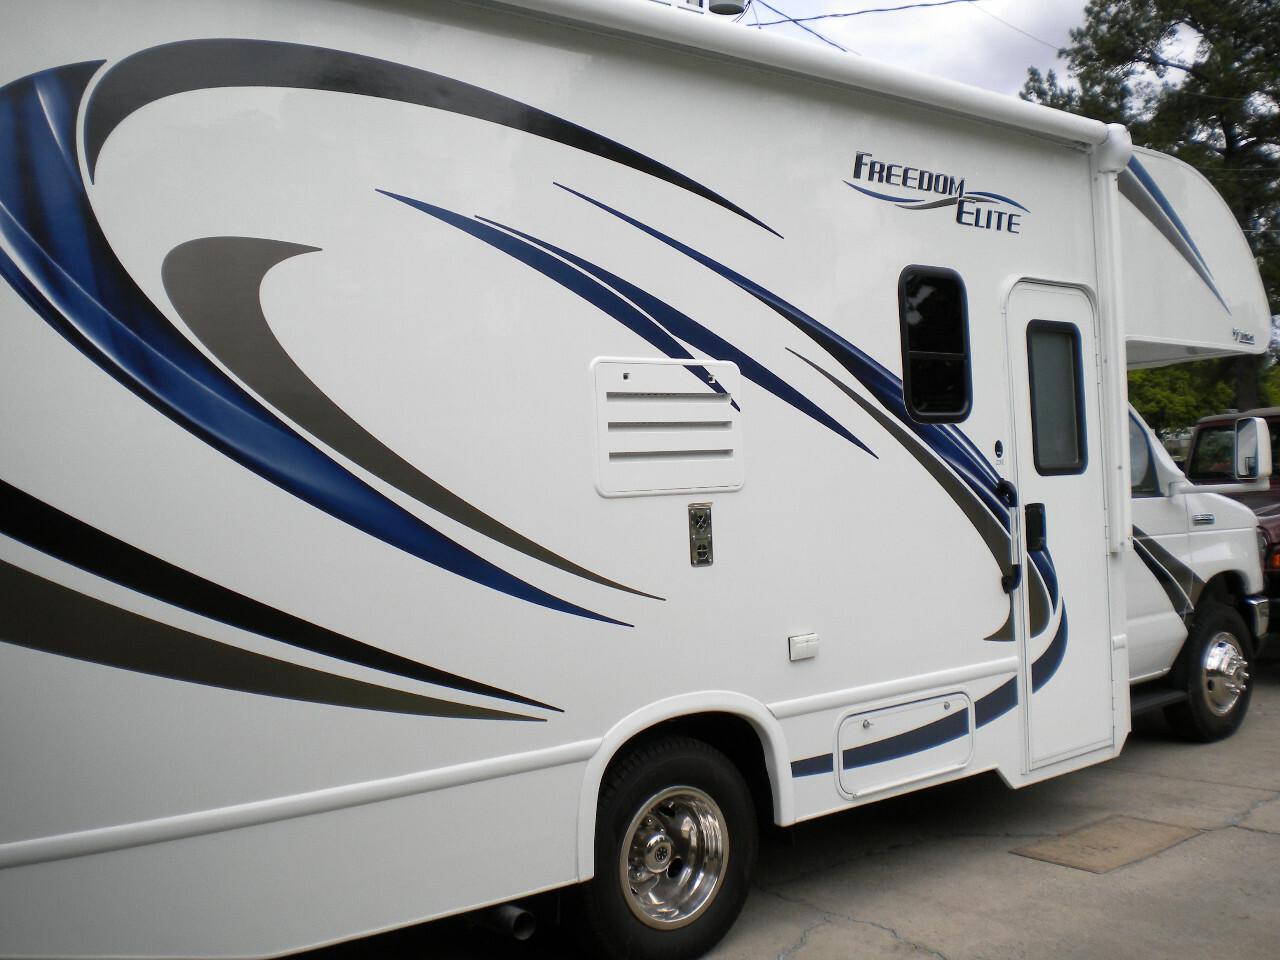 Rv Tires Find Rv Motor Home Camper Tires Gcr Tires >> 36 Thor Motor Coach Freedom Elite M22fe Rvs For Sale Rv Trader